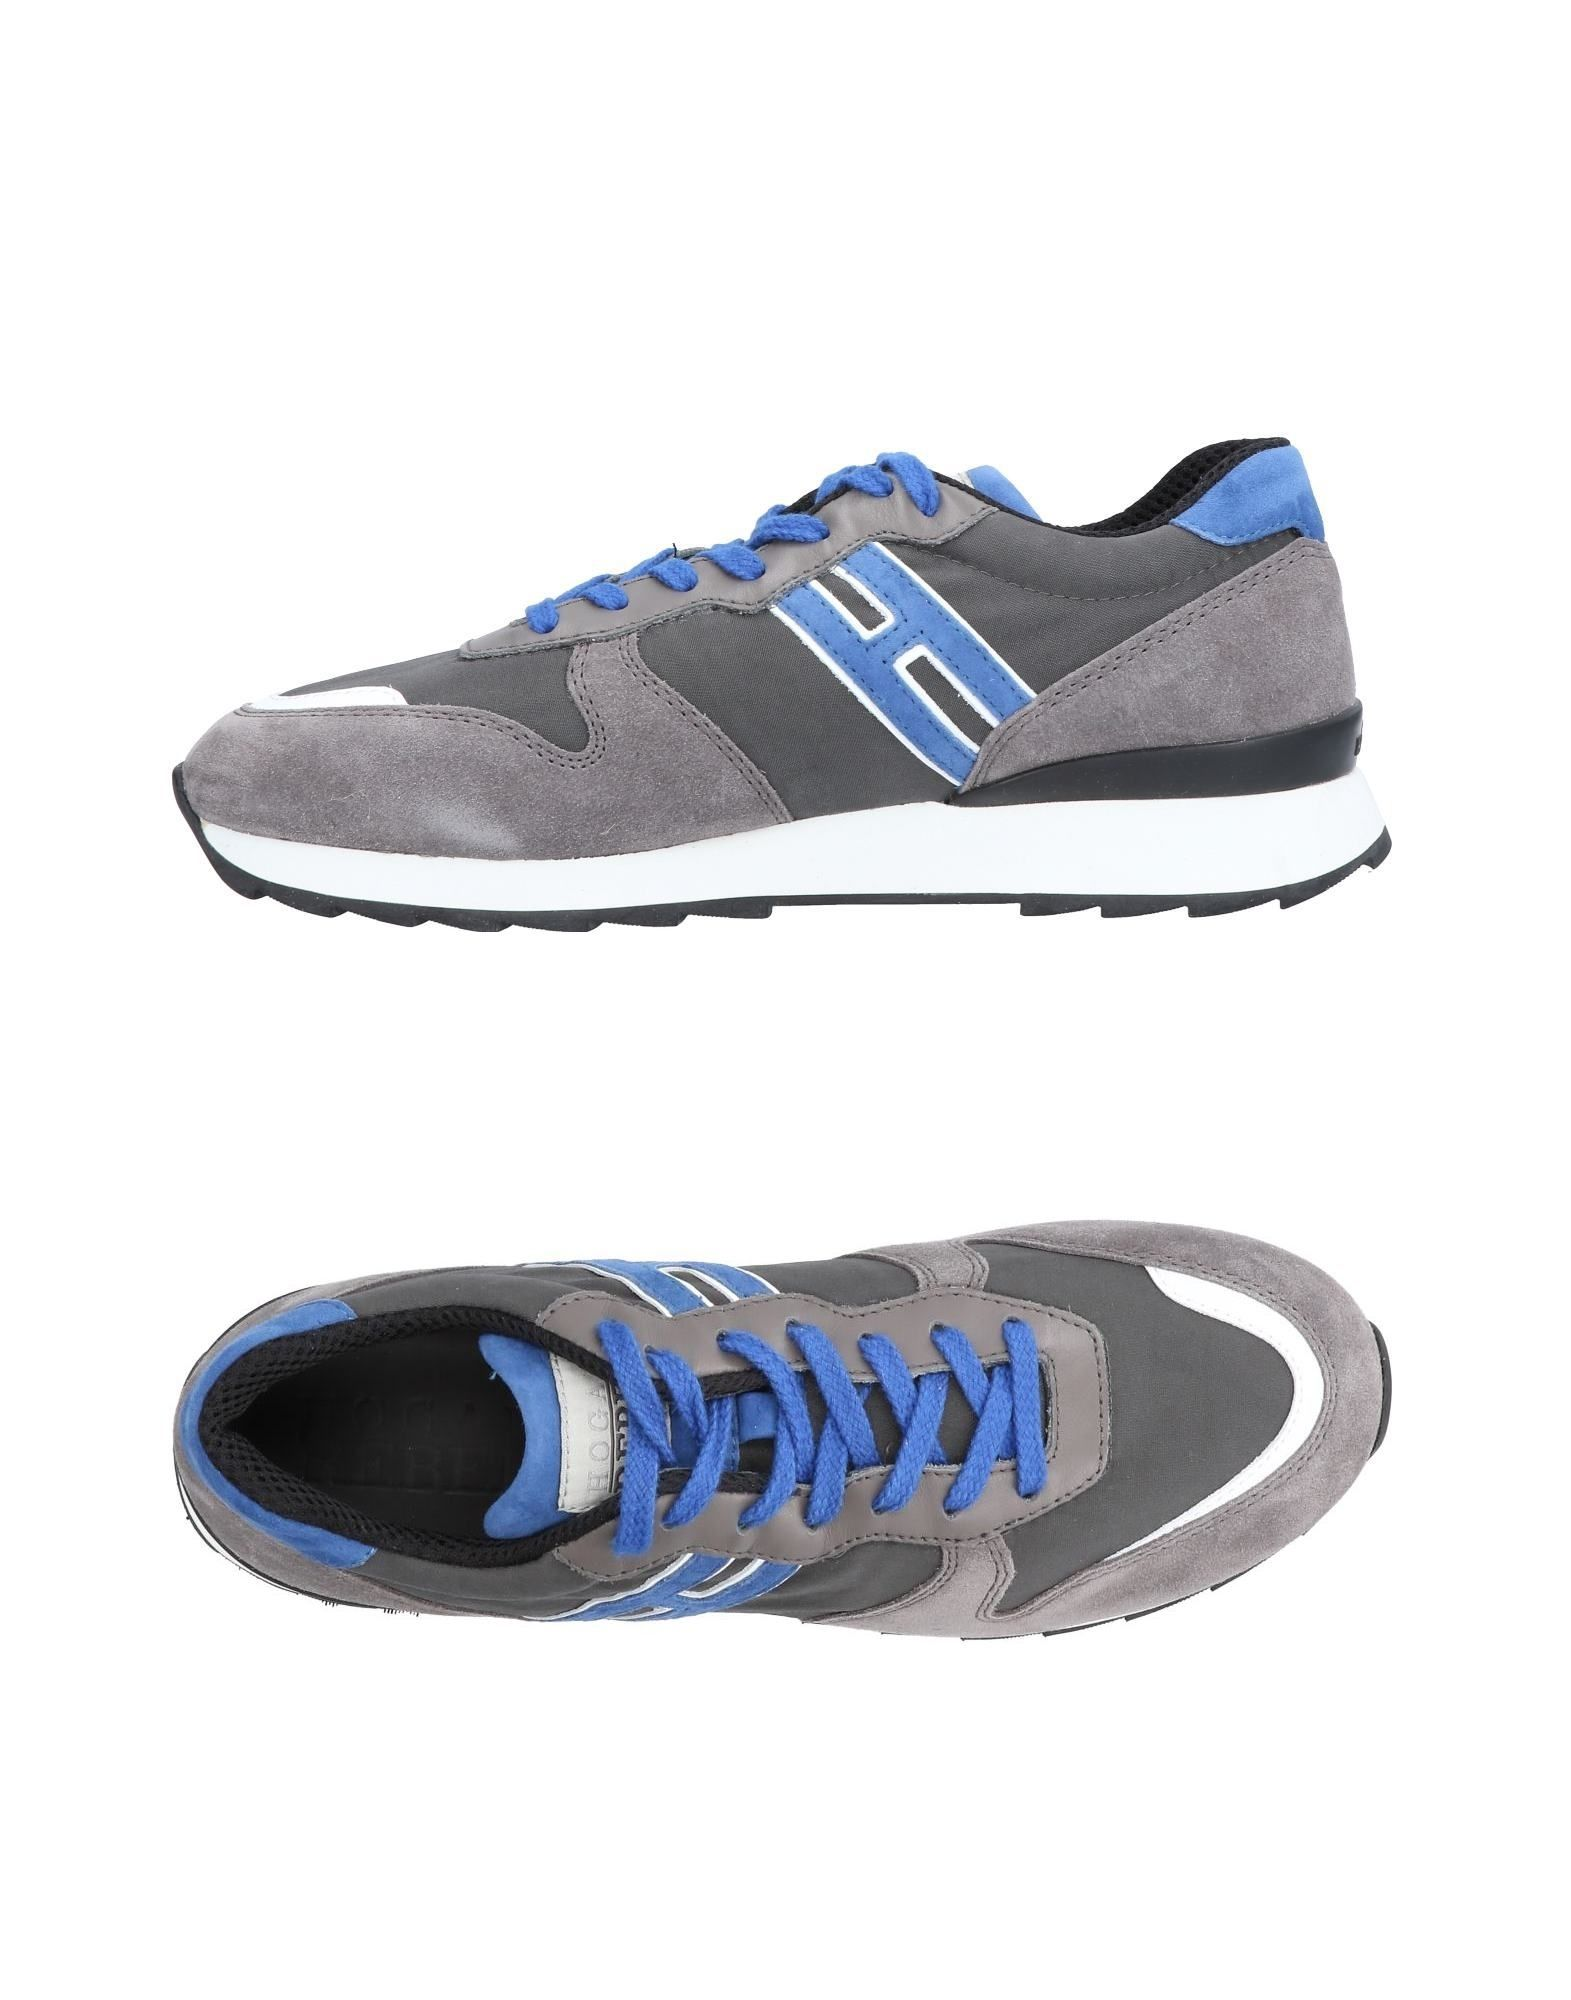 Stilvolle Sneakers billige Schuhe Hogan Rebel Sneakers Stilvolle Damen  11398477QL f1eb59